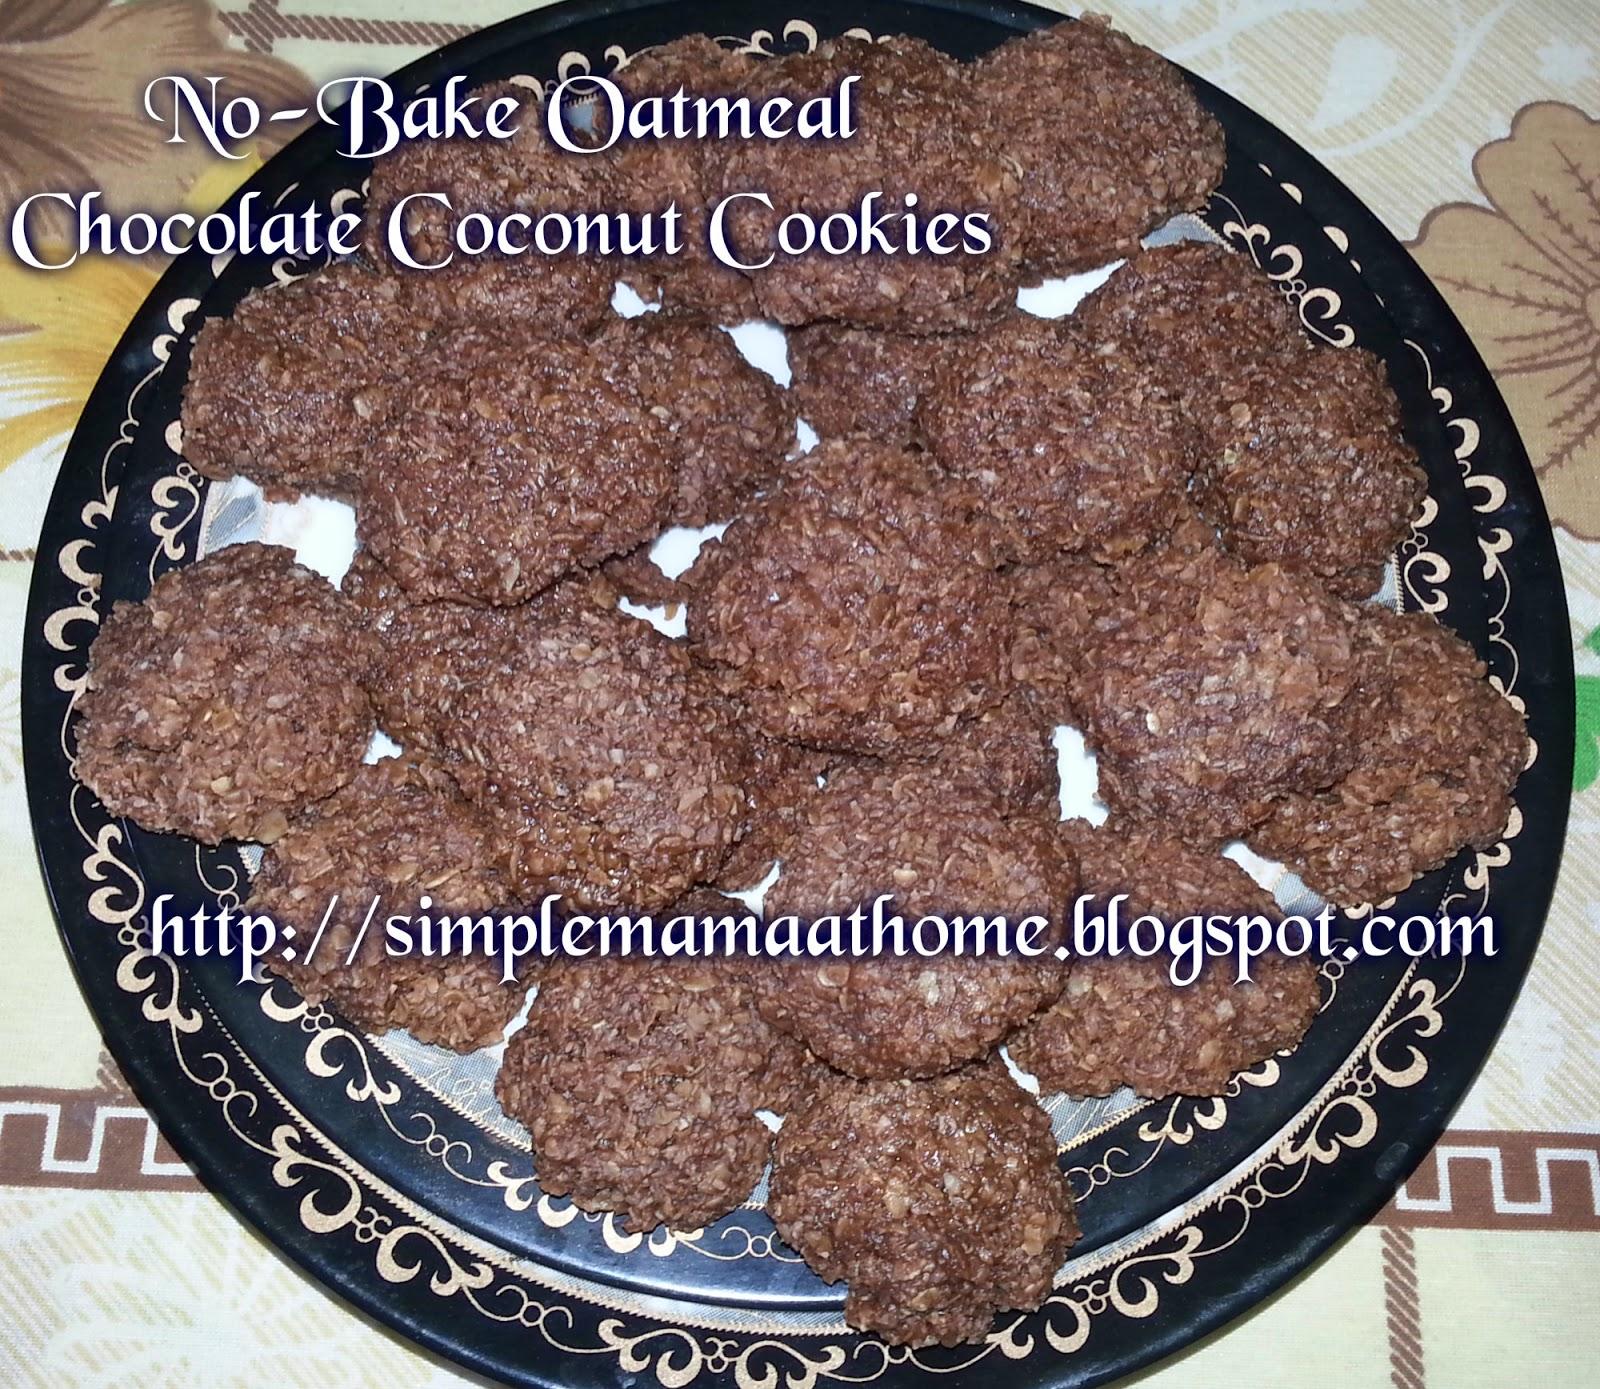 No-Bake Oatmeal Chocolate Coconut Cookies